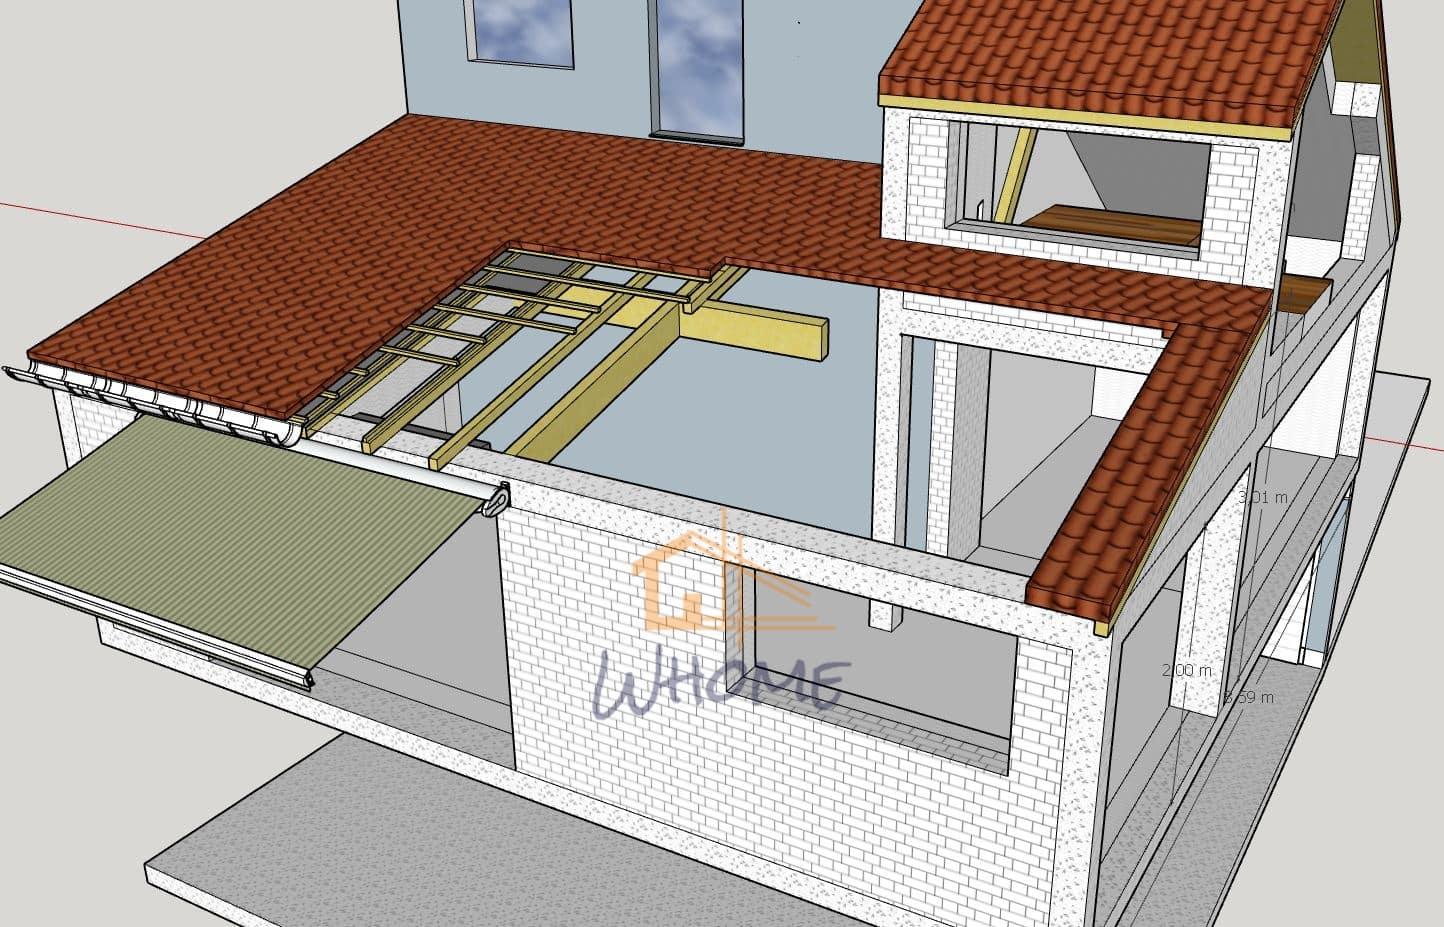 whome-extension-maison-sous-sol-DP-yvelines